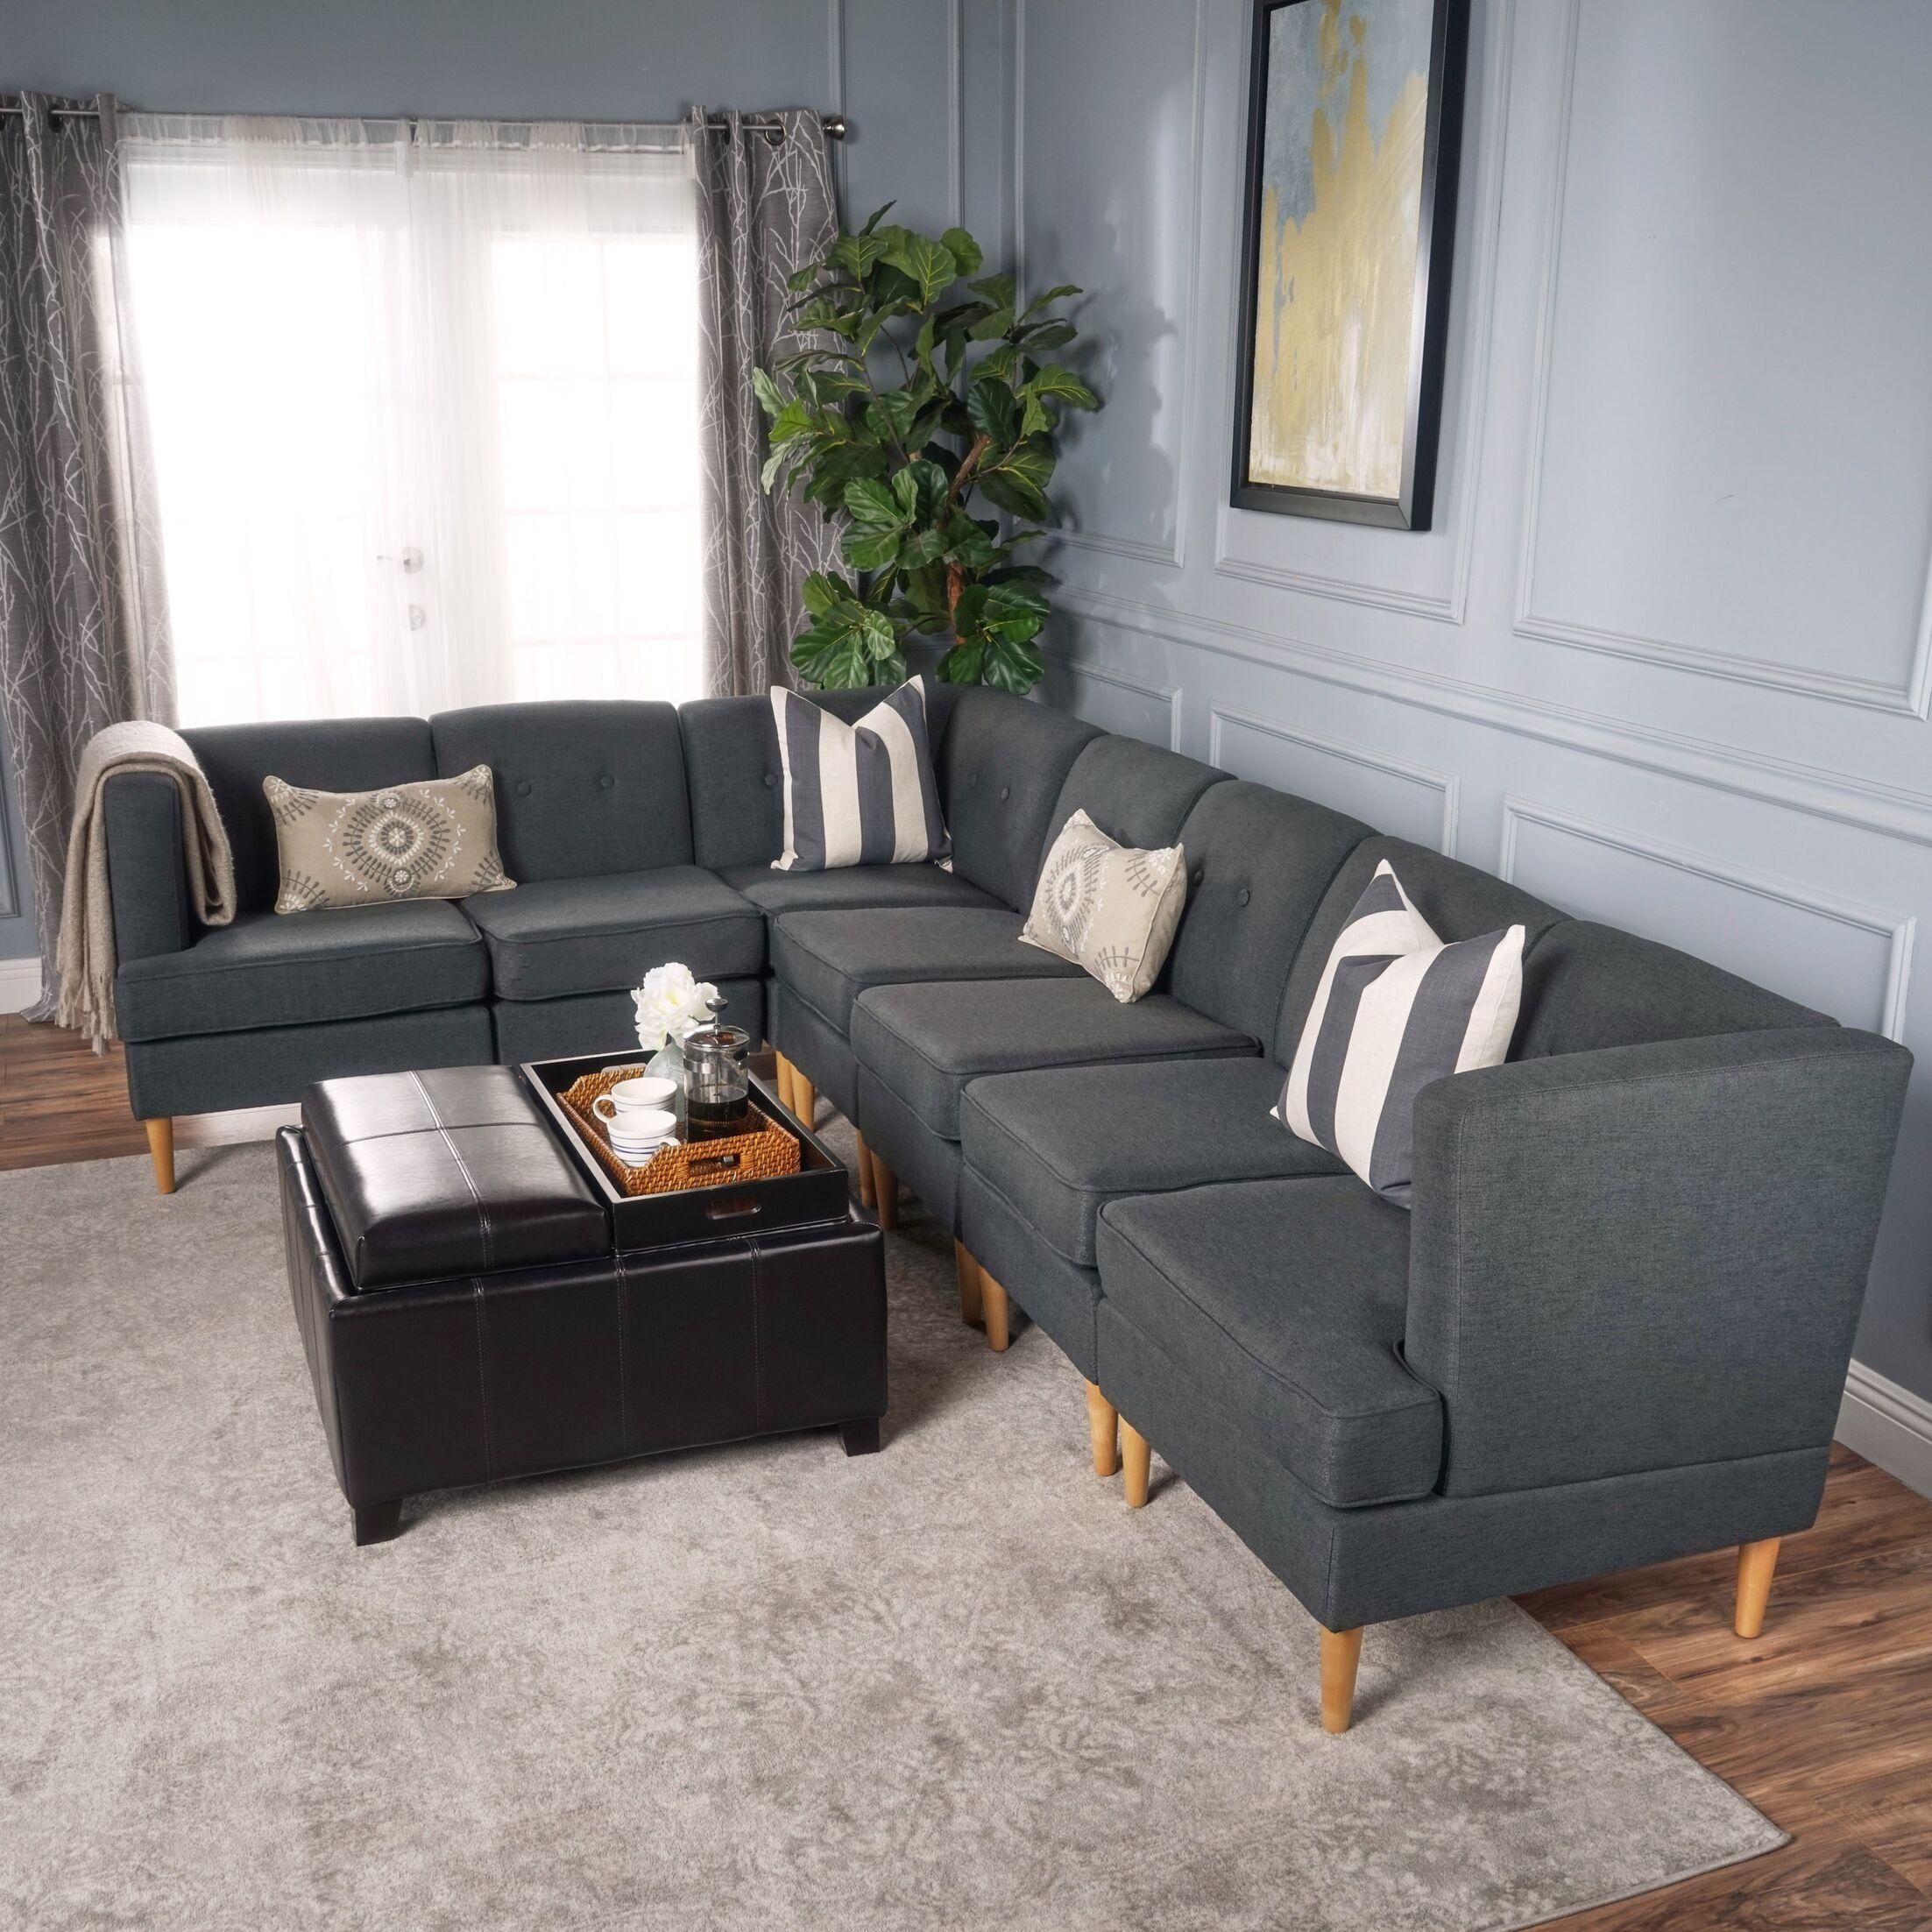 Cassady Modular Sectional Upholstery: Dark Gray